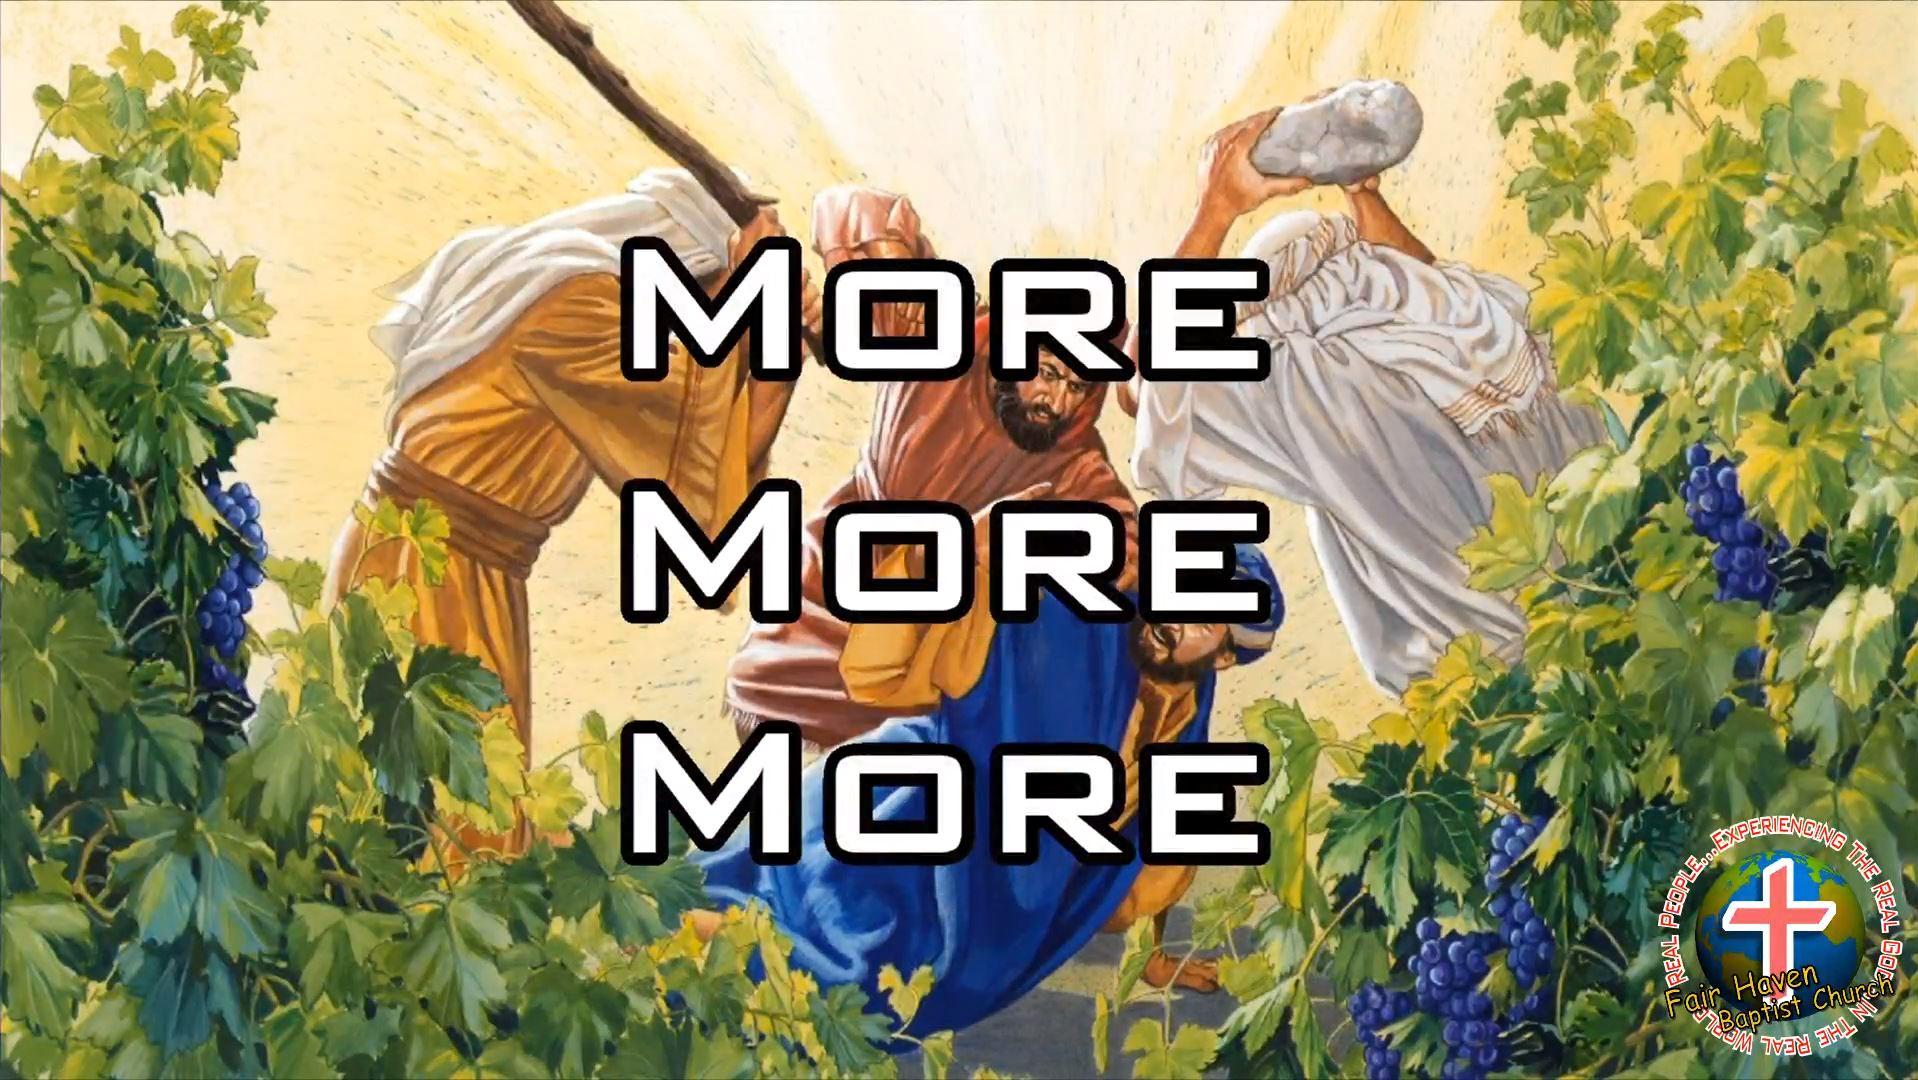 More, More, More